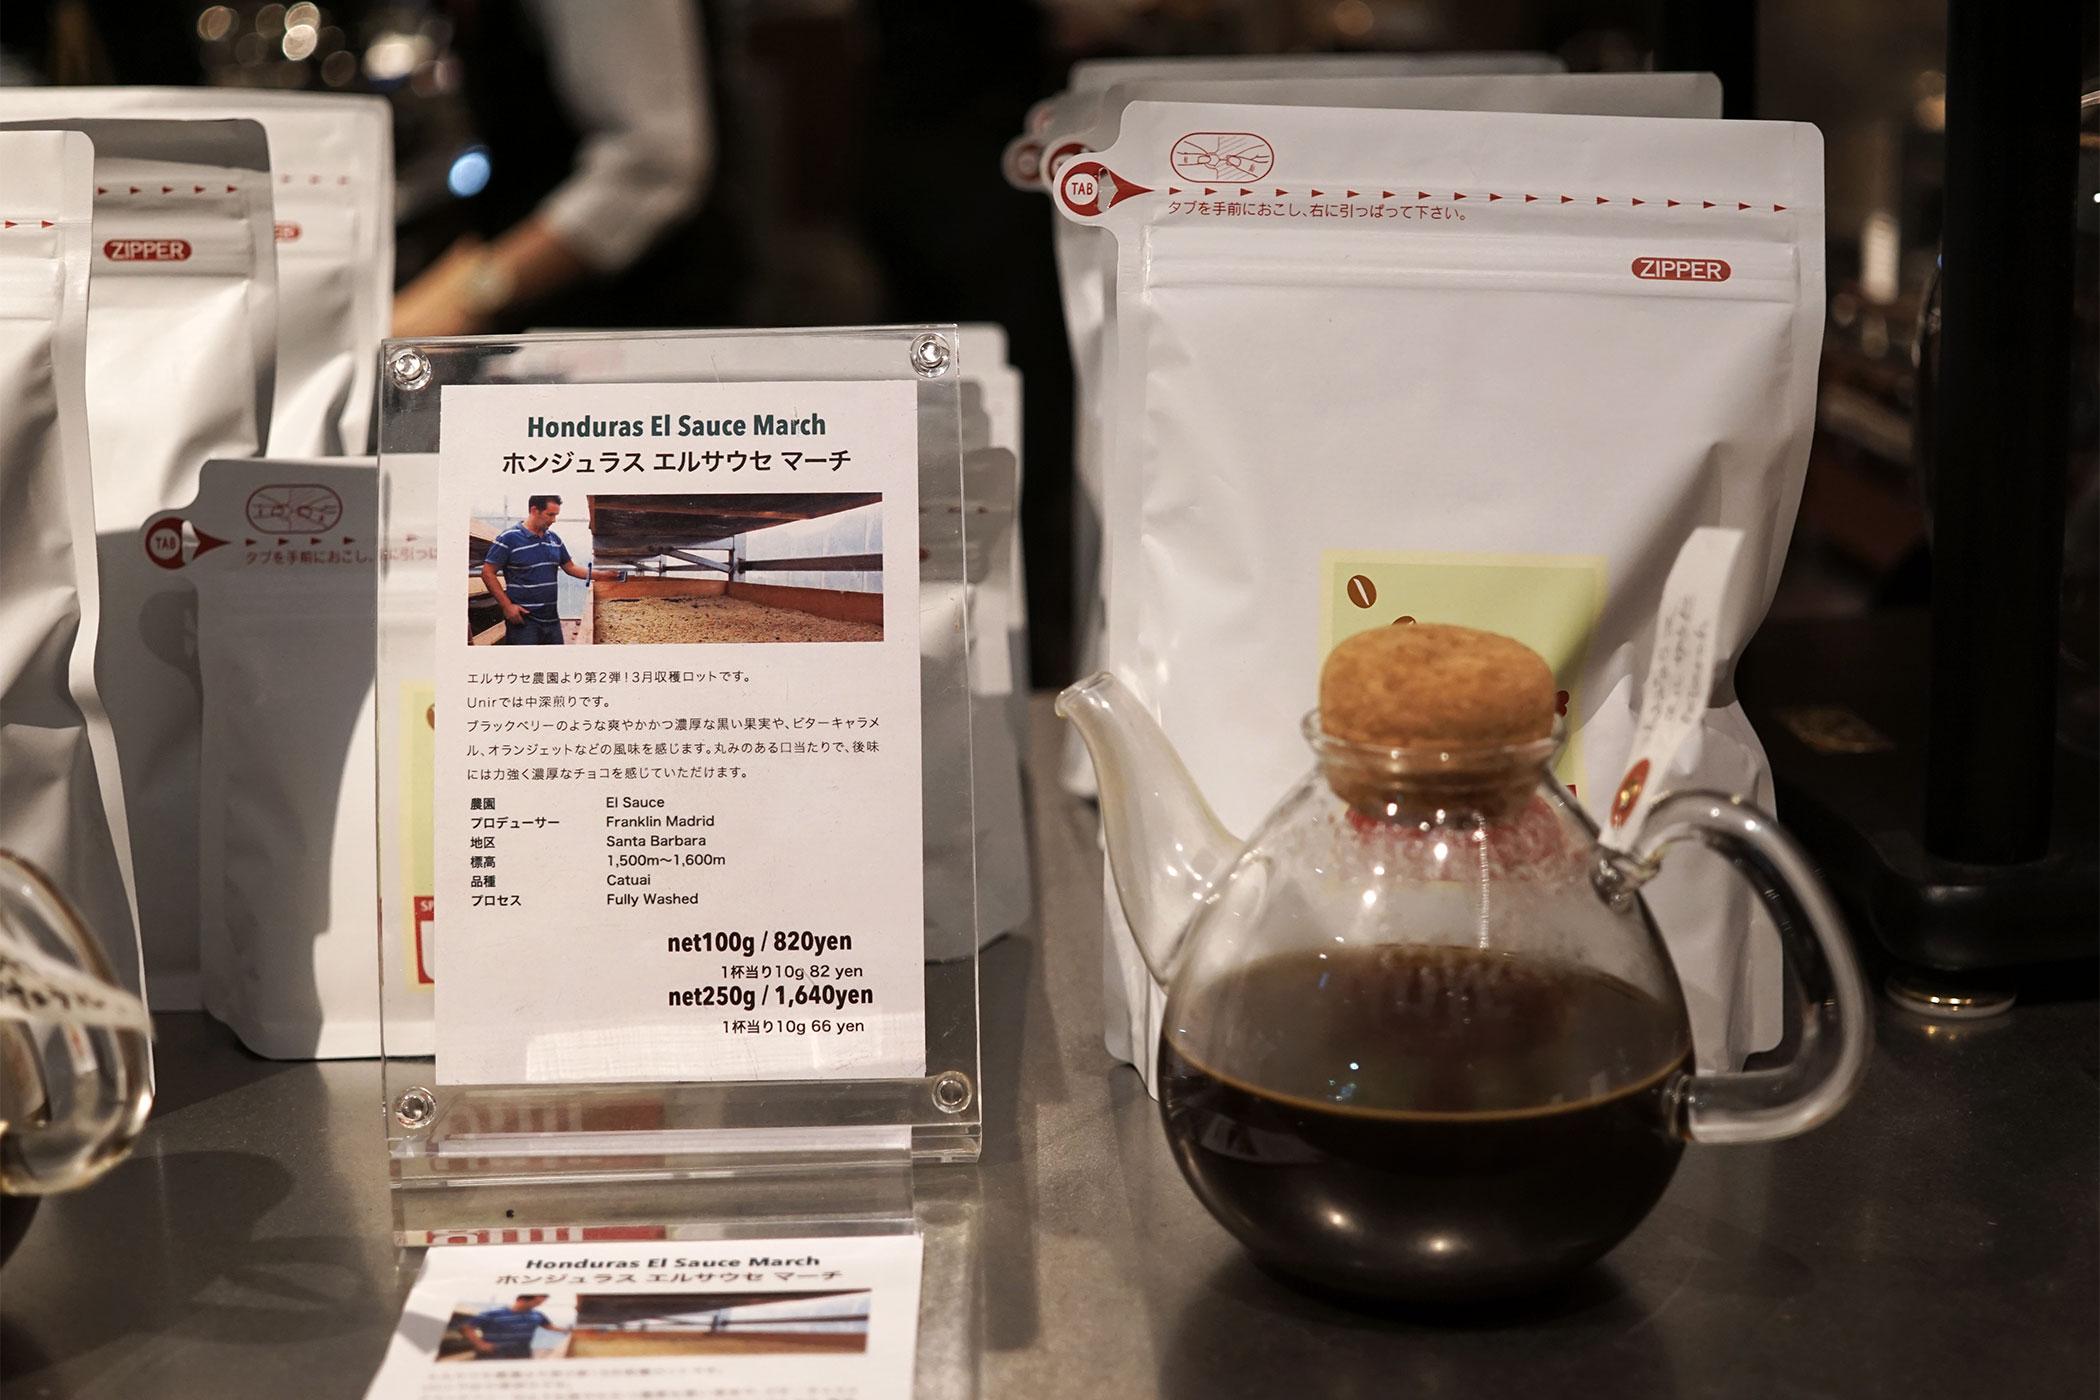 Unir 赤坂店ではコーヒー豆の販売も。時間は限られているのでご注意を。